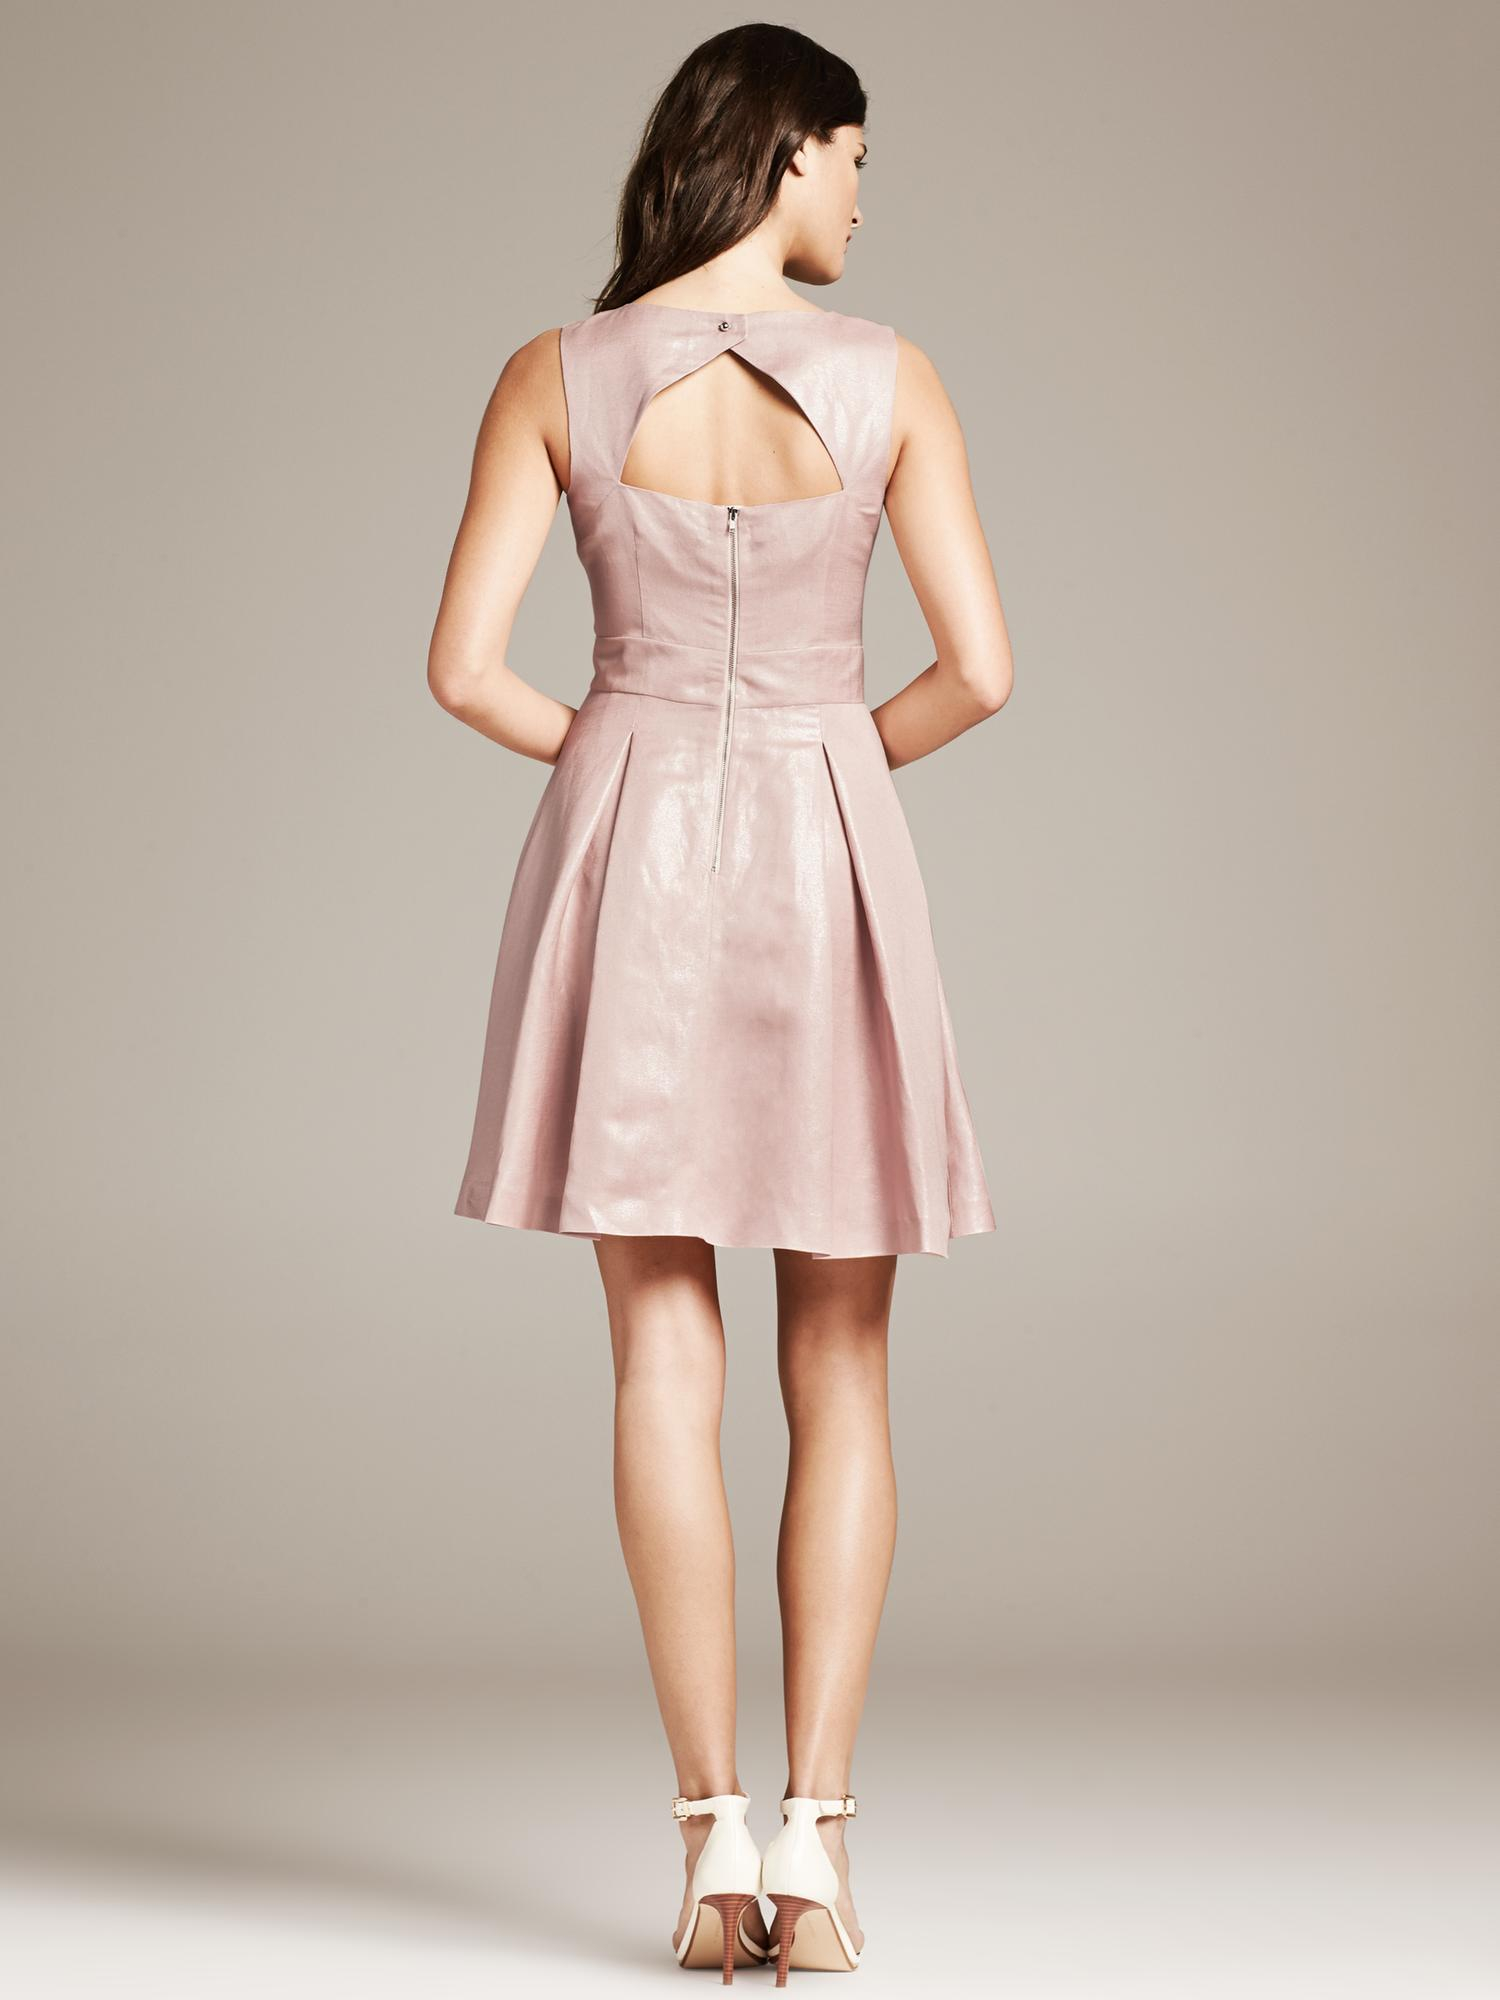 Banana Republic Monogram Metallic Pink Fit And Flare Dress